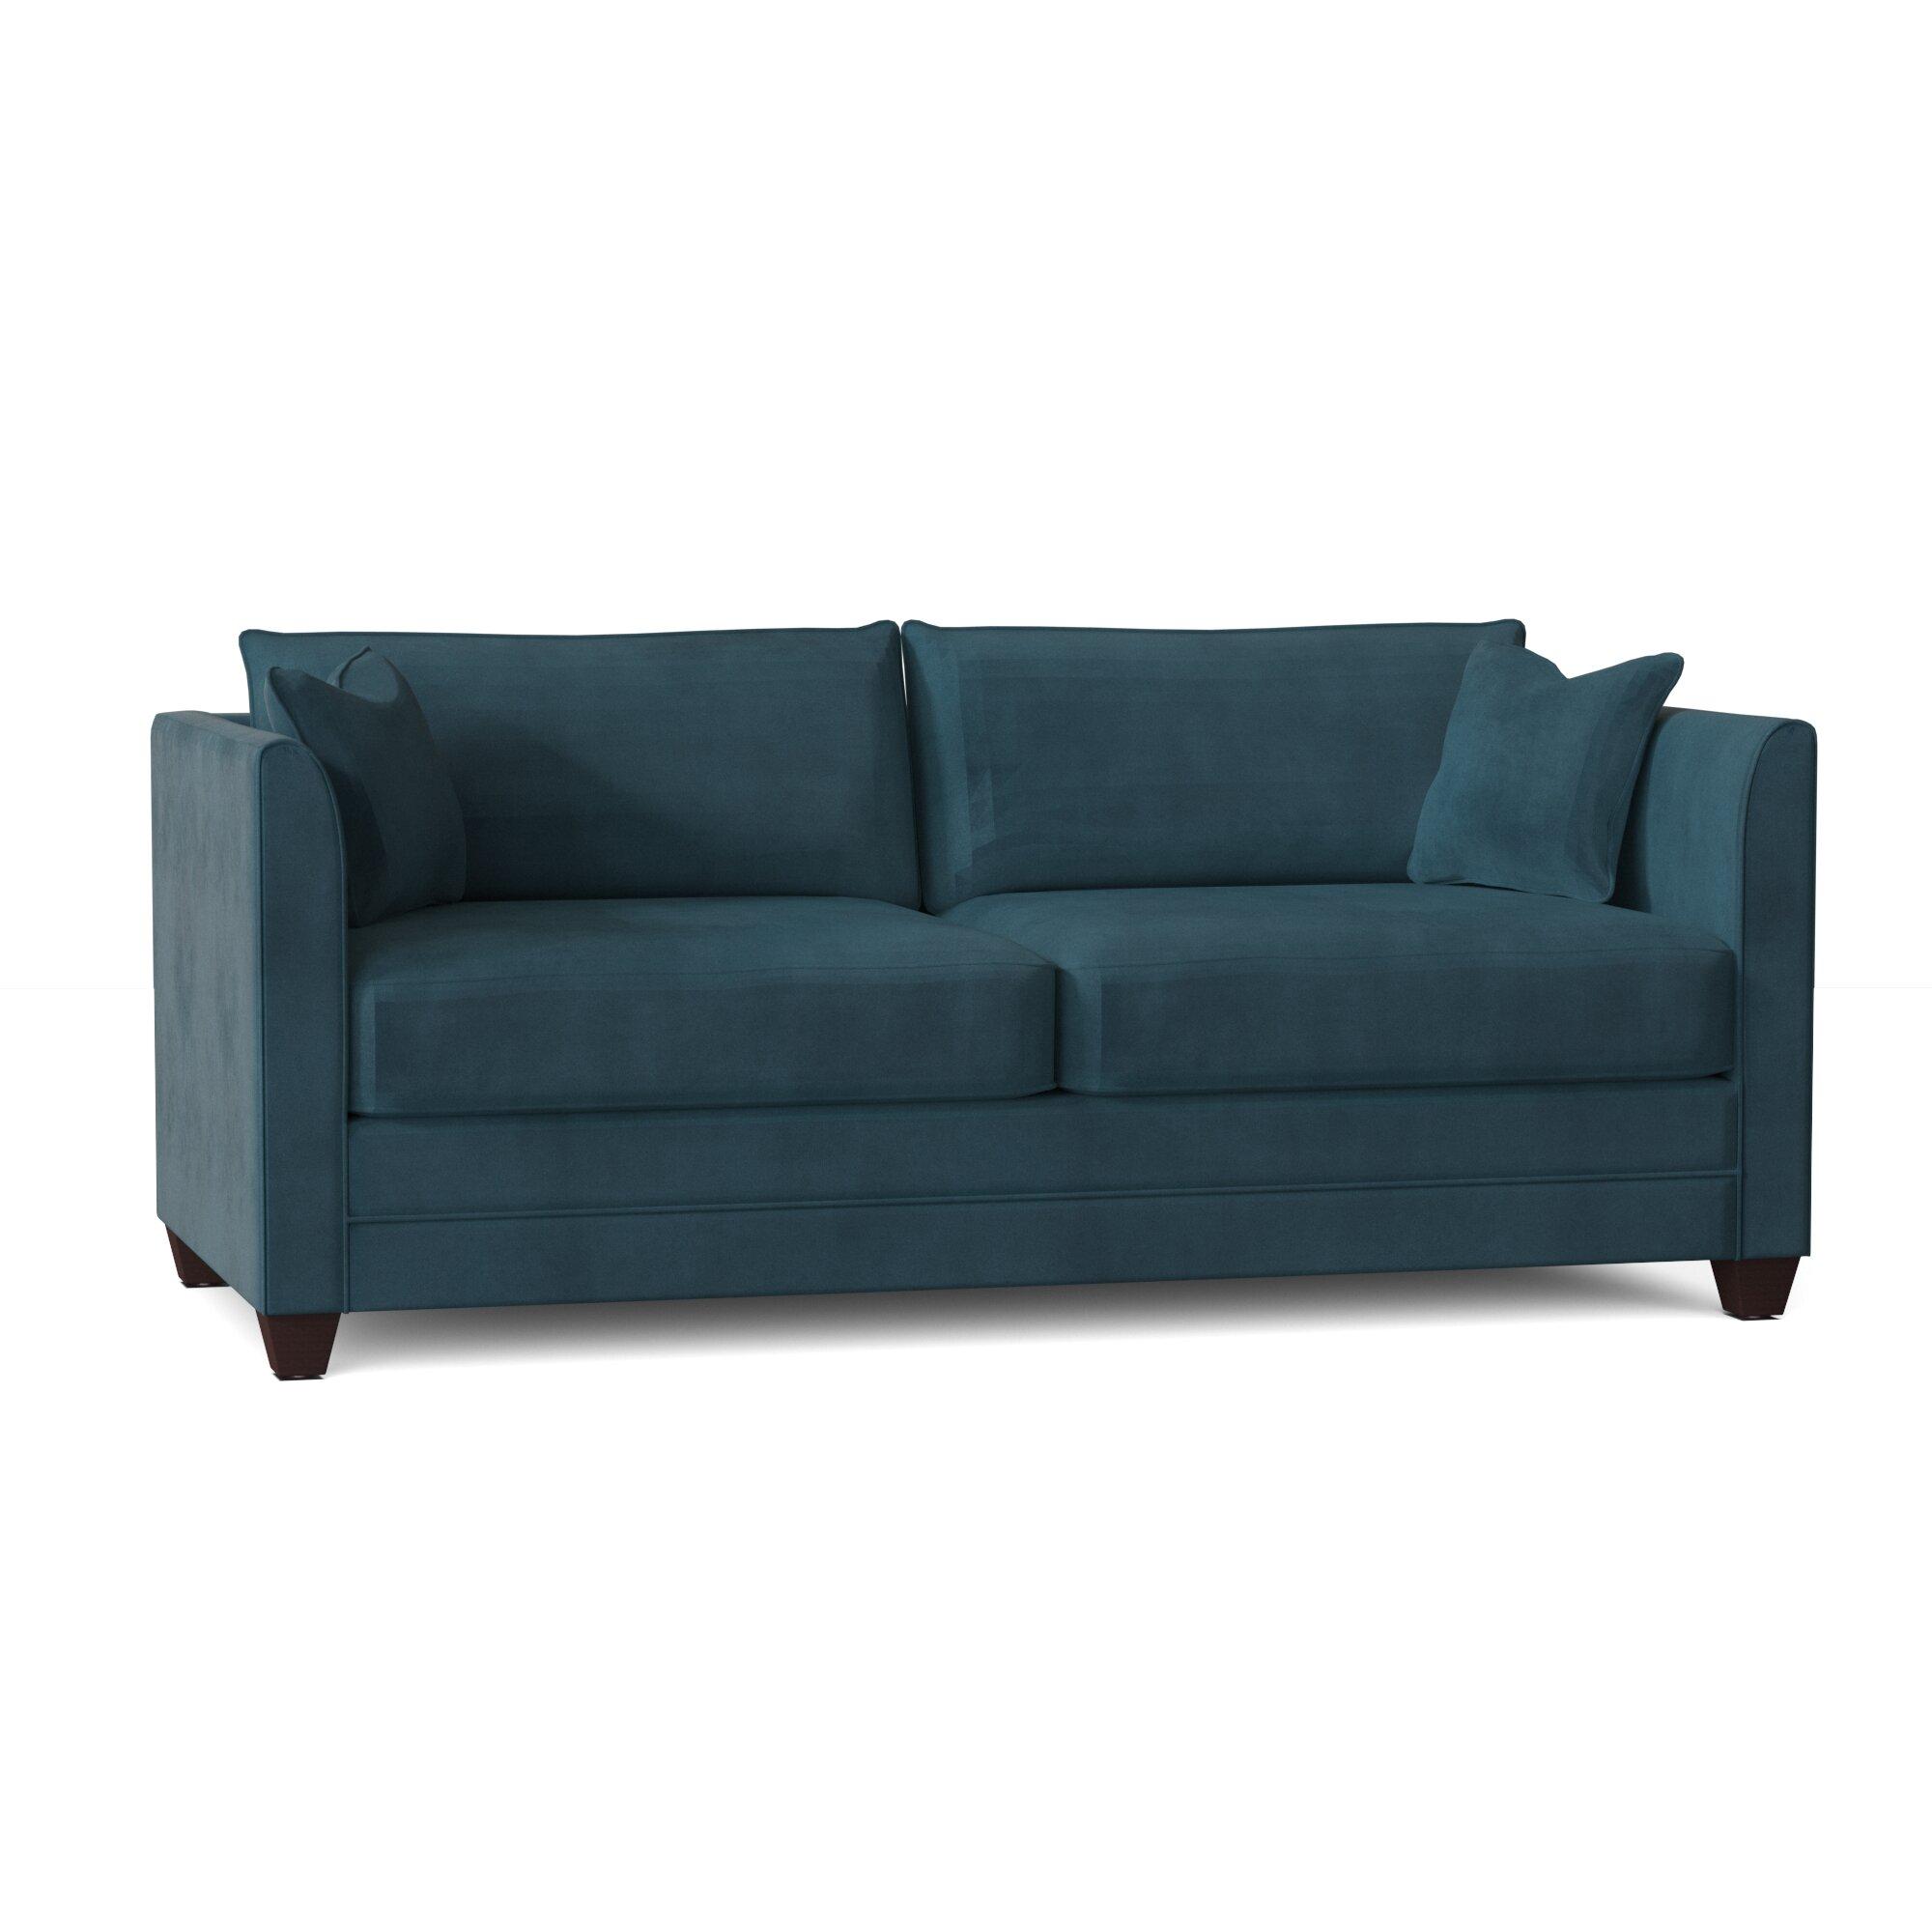 Sarah 77 Square Arm Sofa Bed Reviews Joss Main